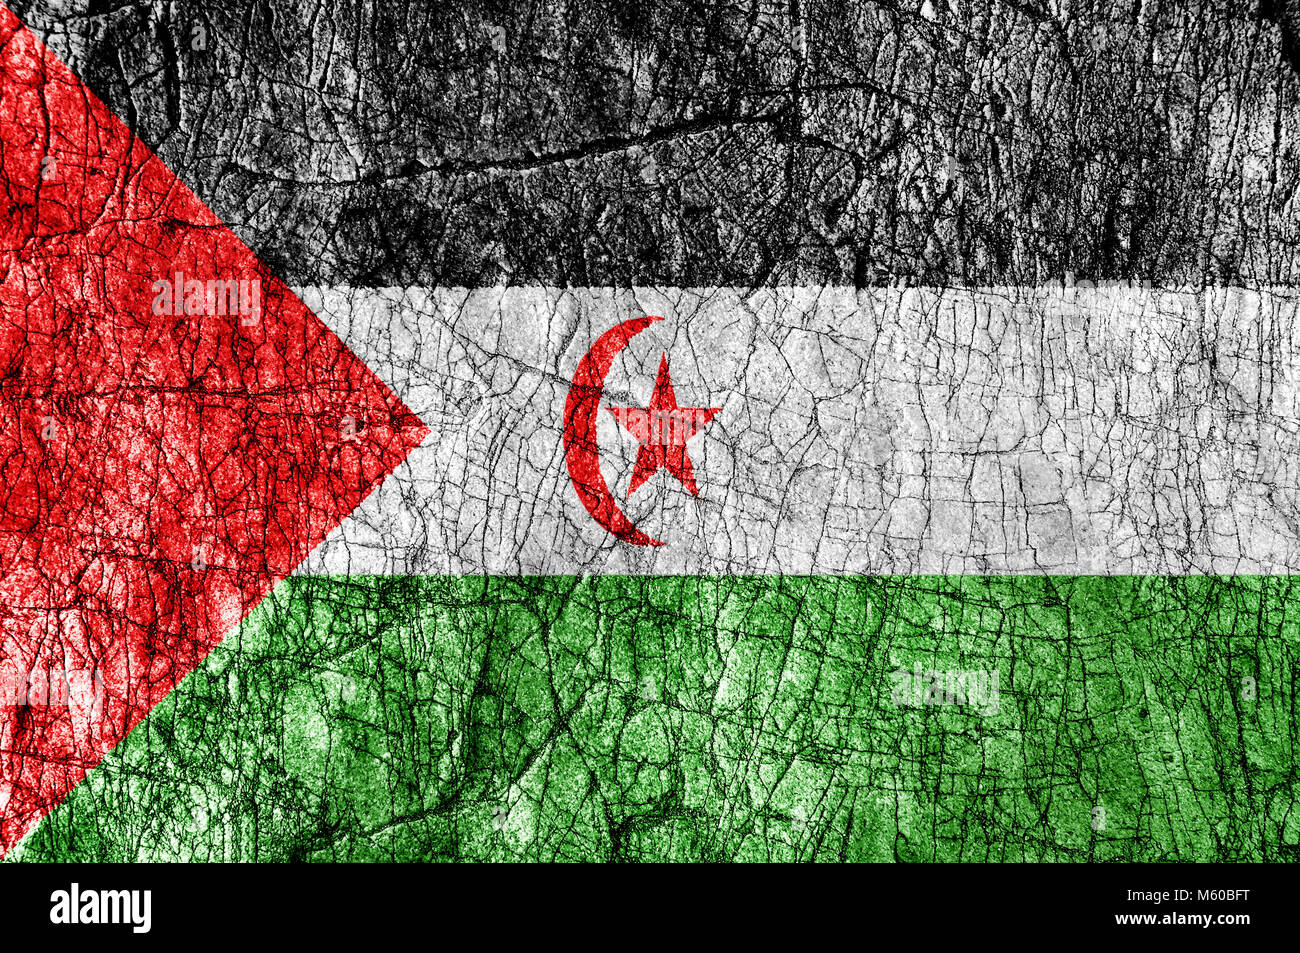 Grudge stone painted Sahrawi Arab Democratic Republic flag - Stock Image